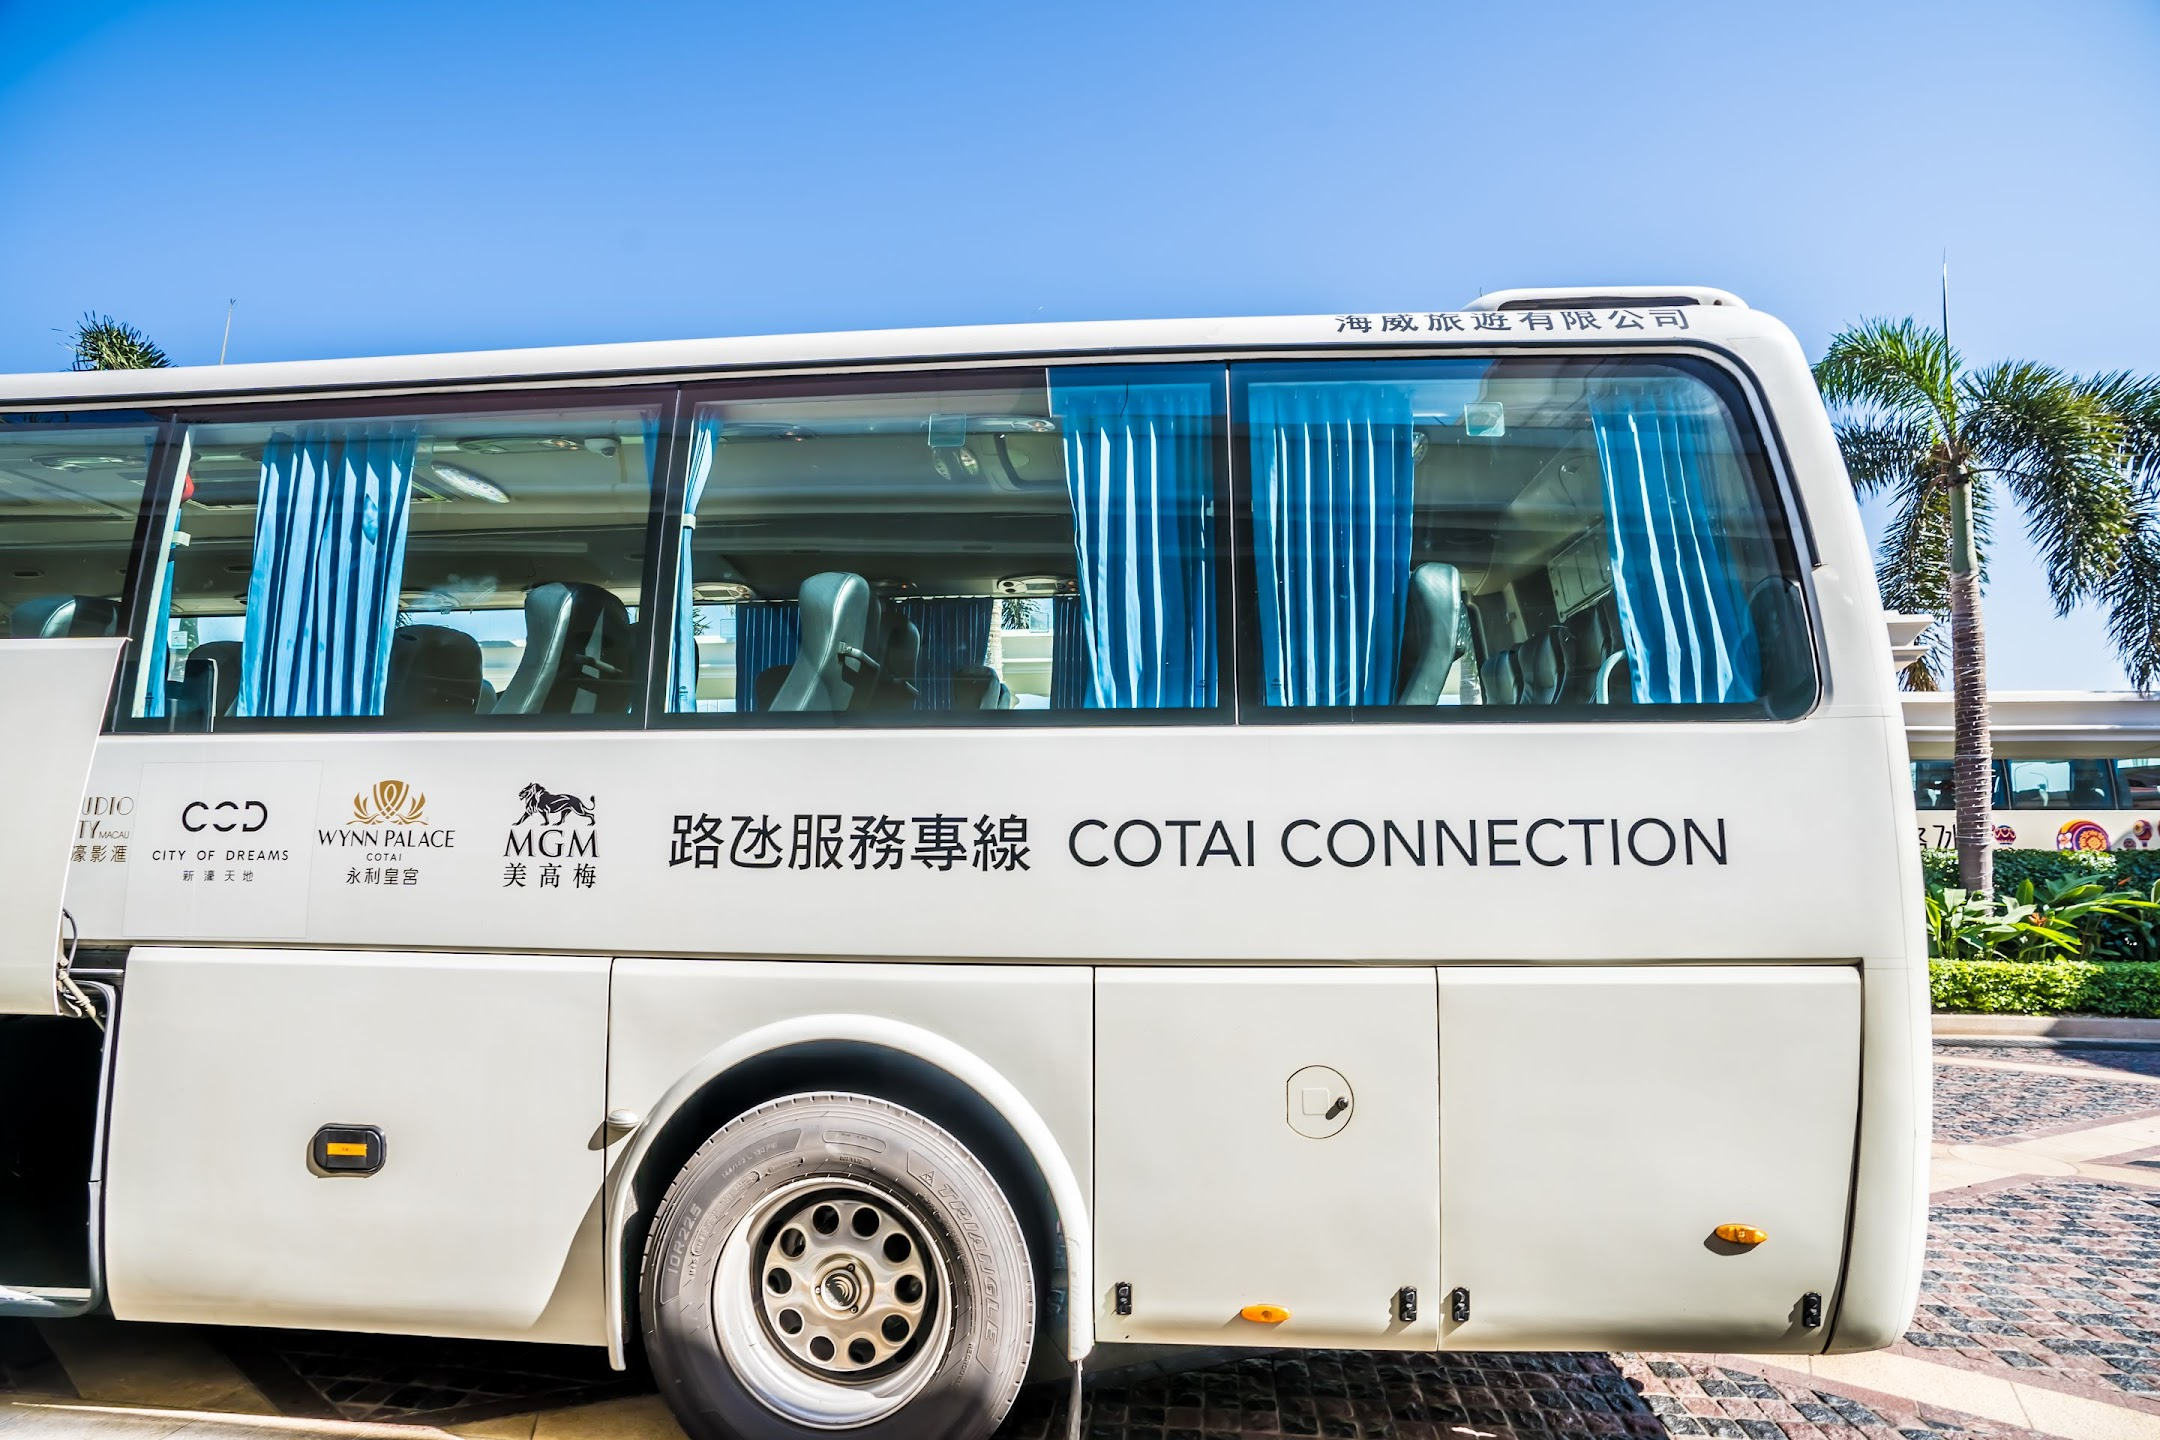 Macau Cotai Connection